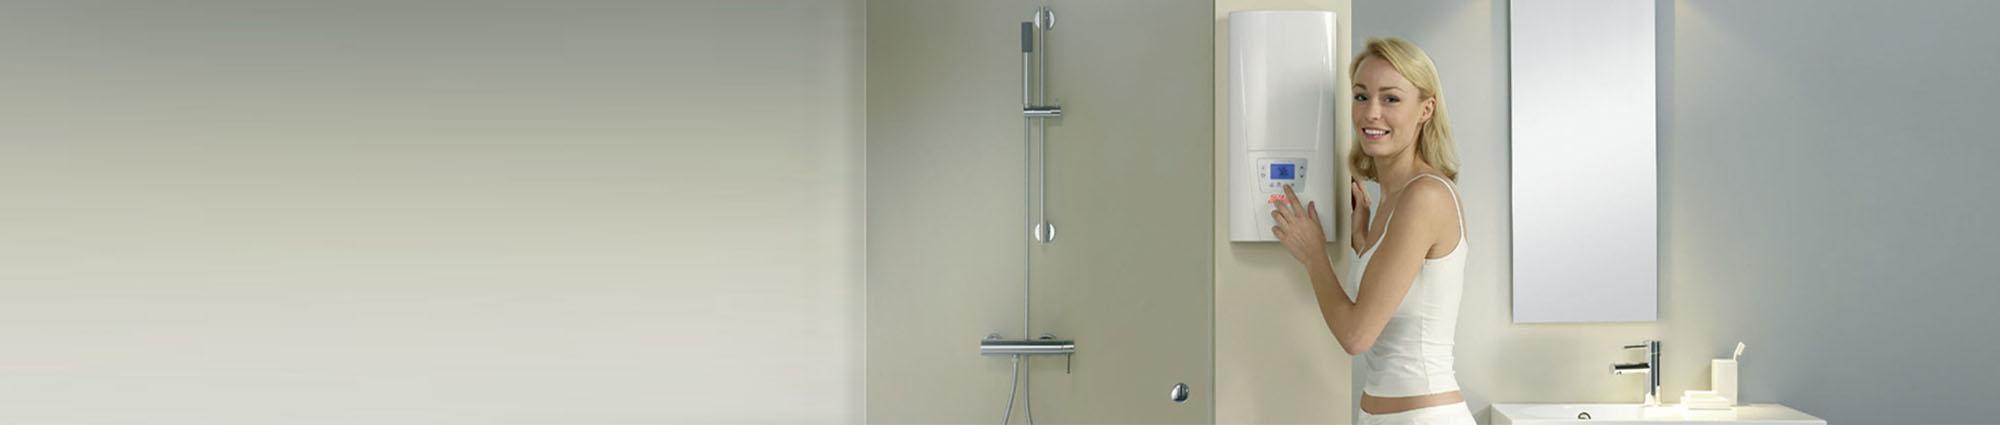 Zip Hot Water Instant Australia Wiring Diagram For Heater Element